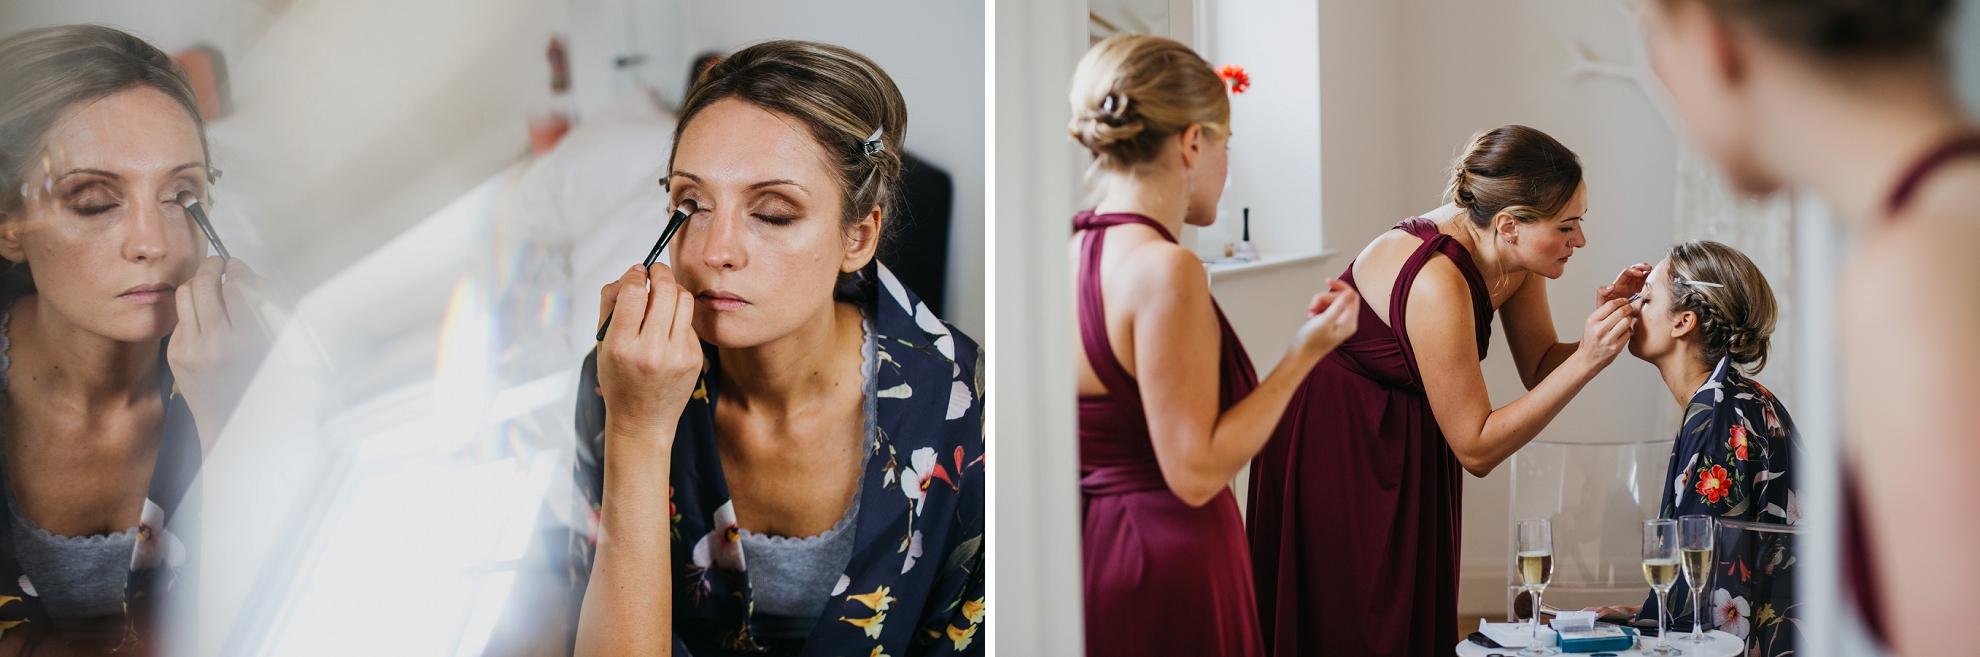 broughton-hall-wedding-photographer_020